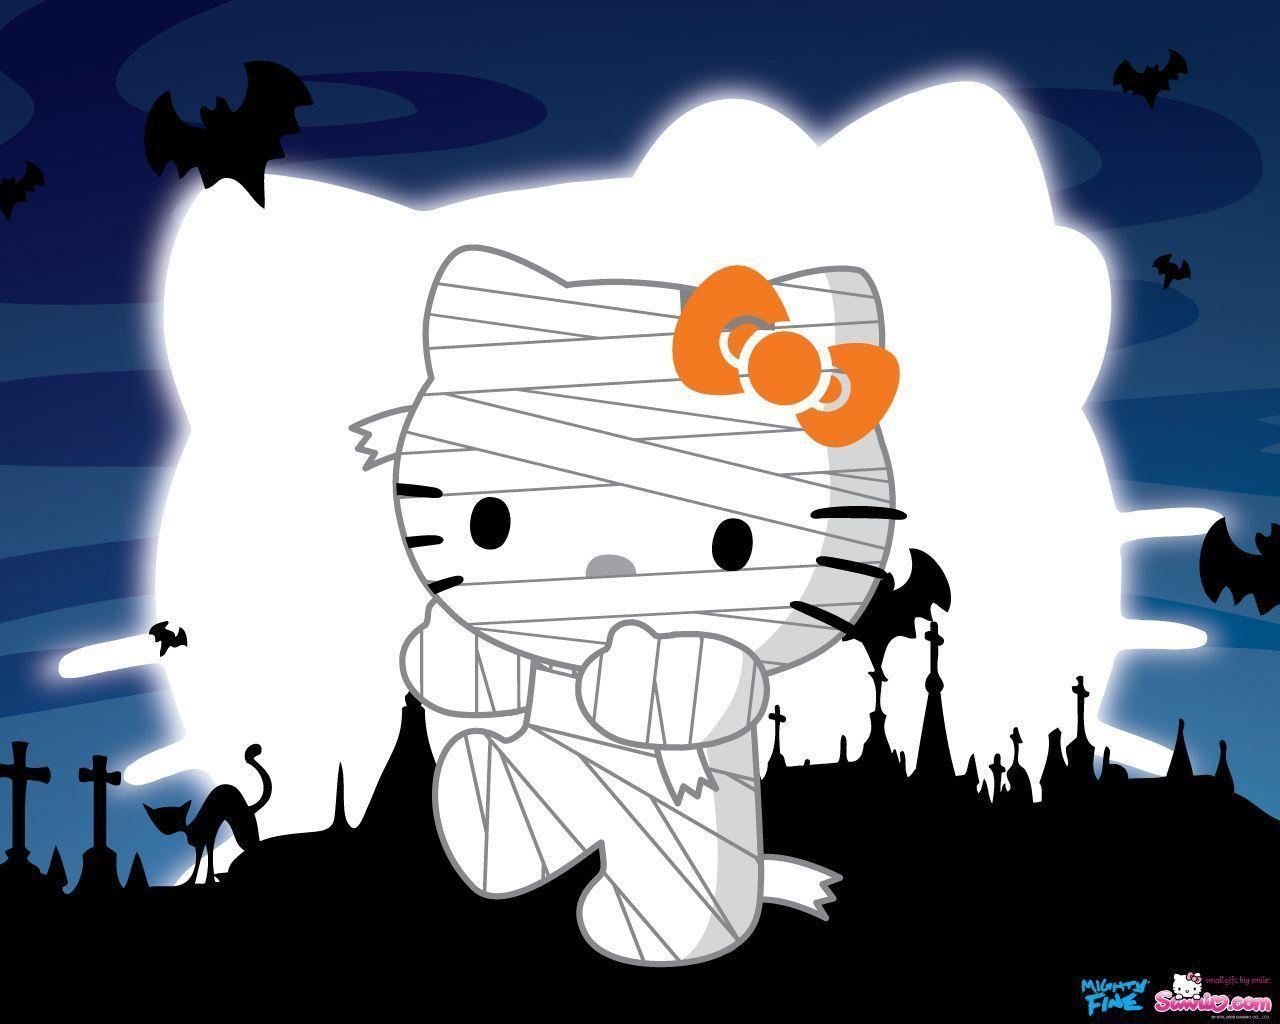 Look - Kitty Hello happy halloween wallpaper pictures video